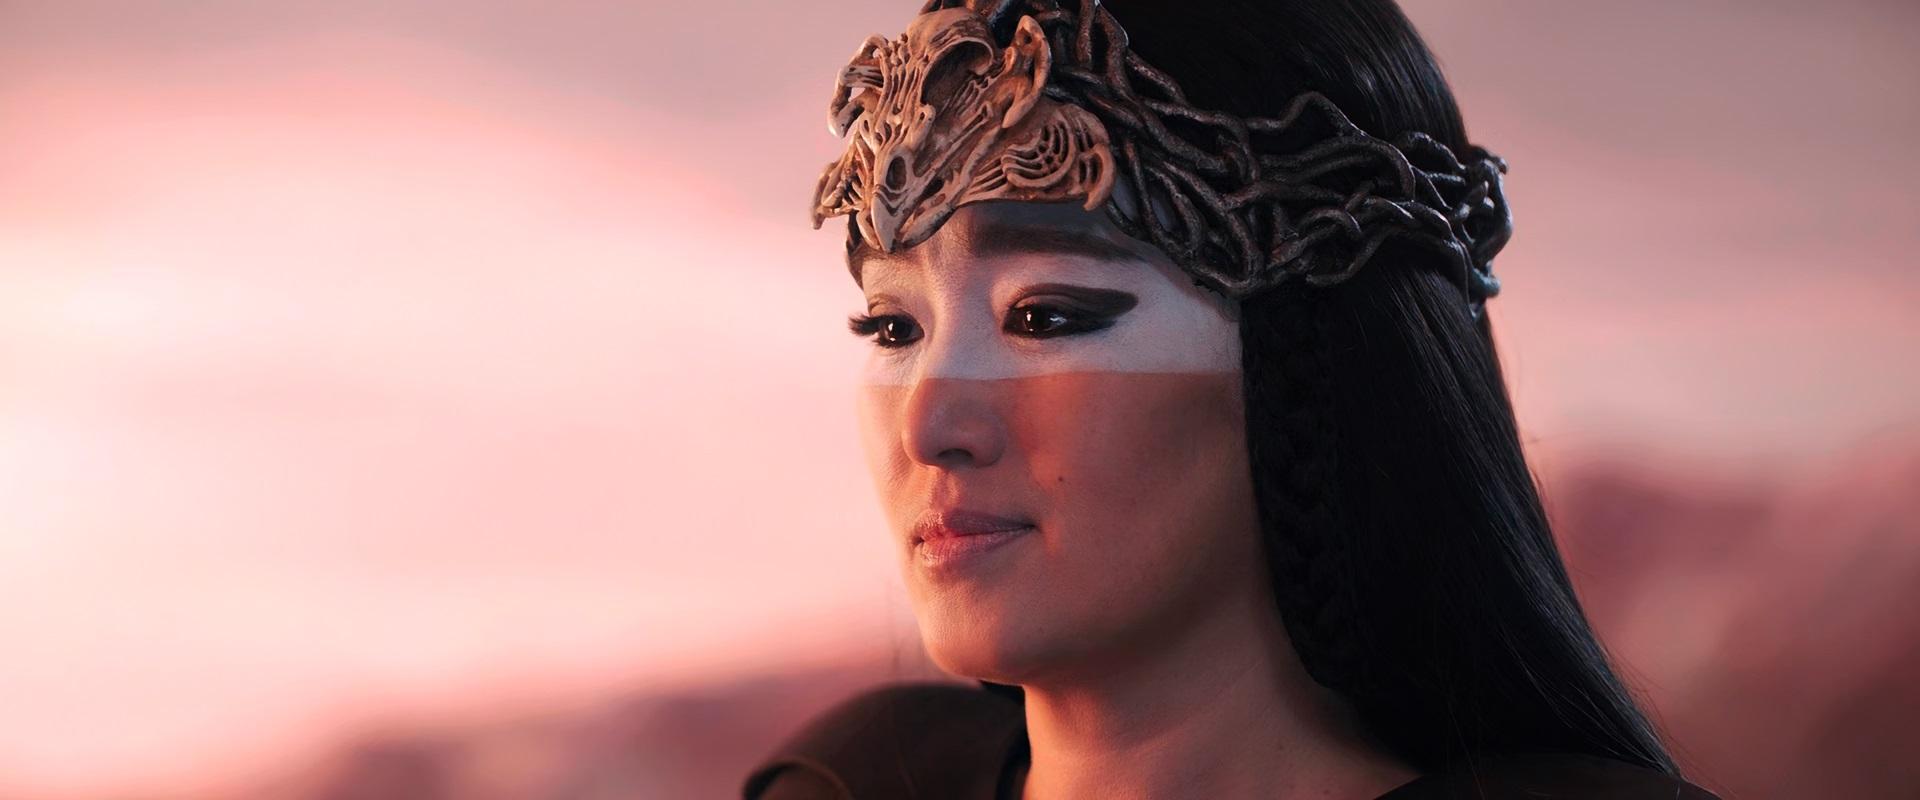 Mulan | 2020 | BDRip | XviD | Türkçe Dublaj | 1080p - m720p - m1080p | BluRay | Dual | TR-EN | Tek Link